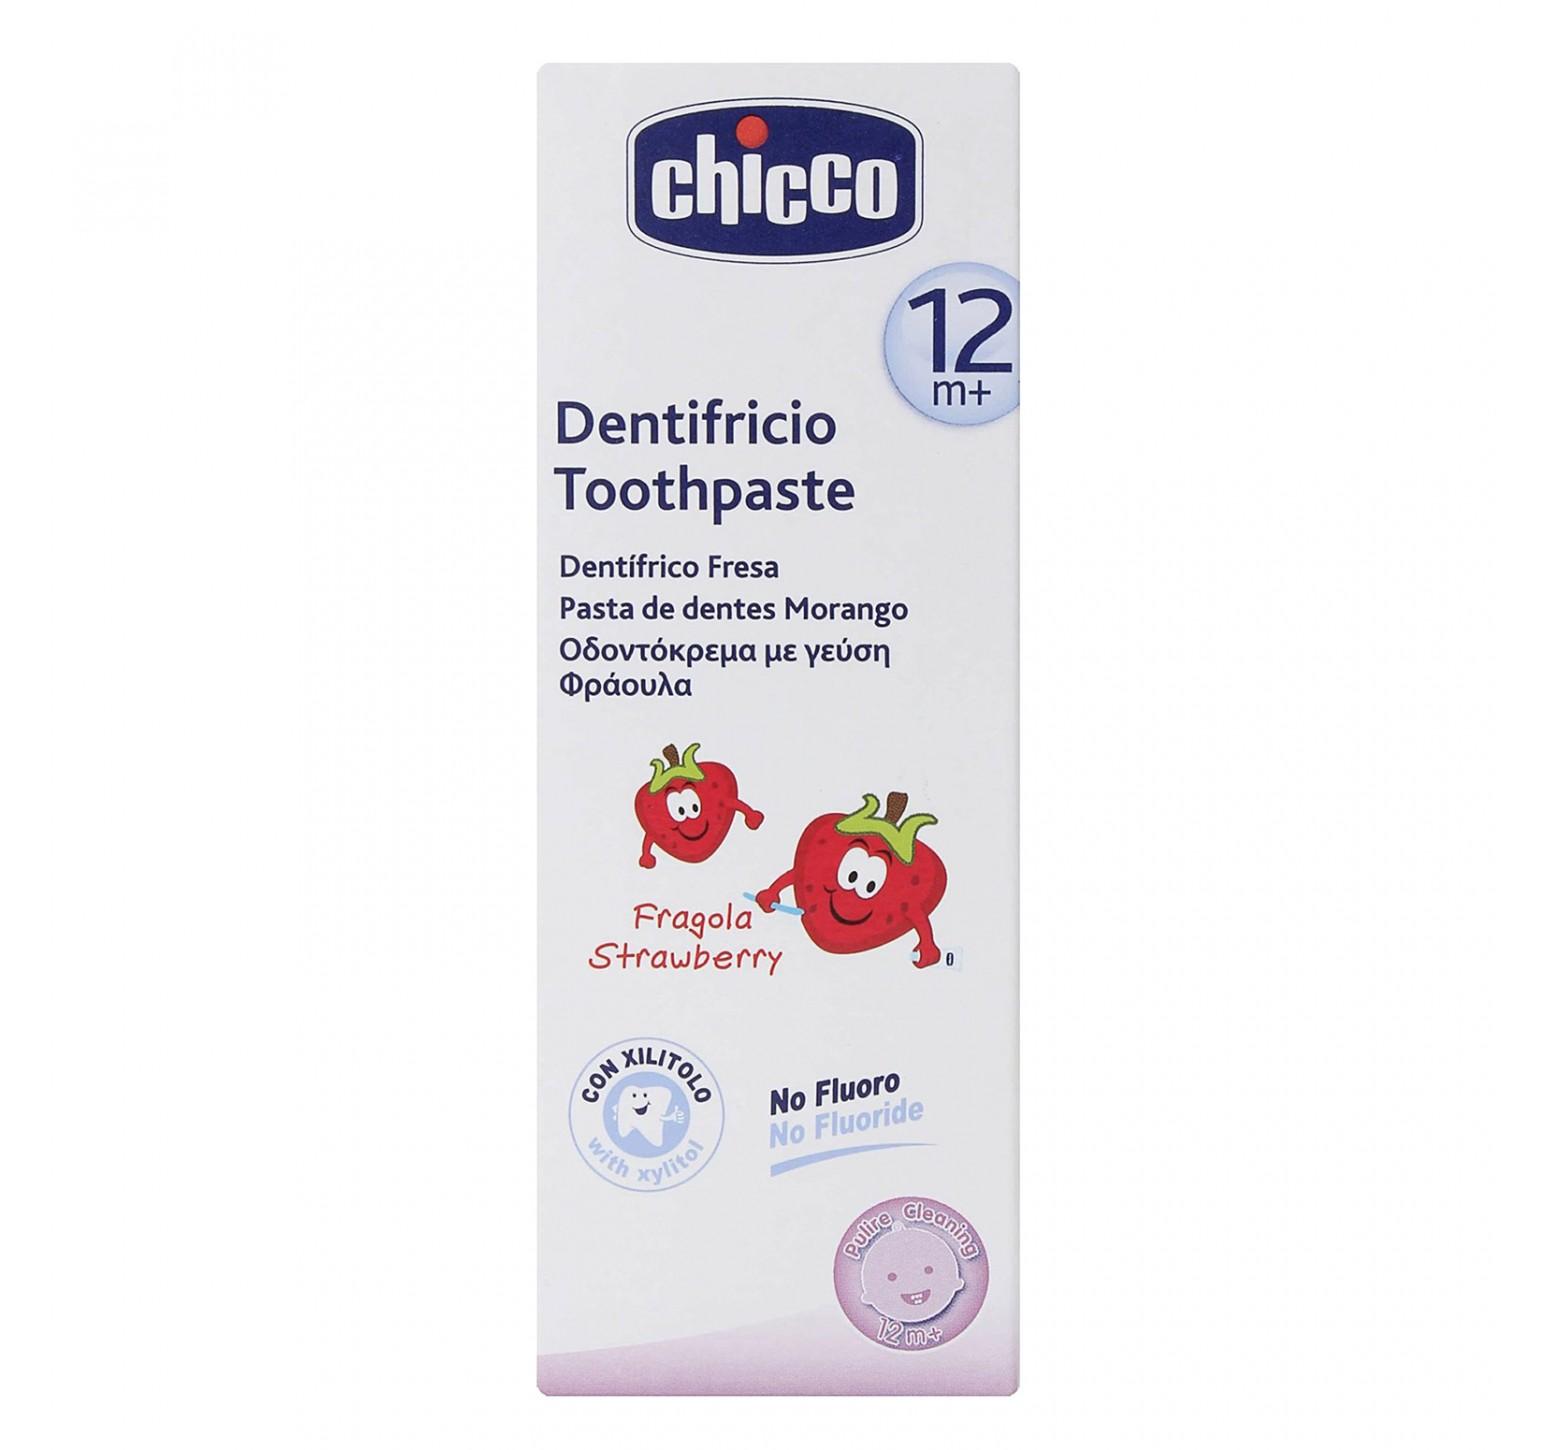 Chicco Pasta dental 12m+ fresa